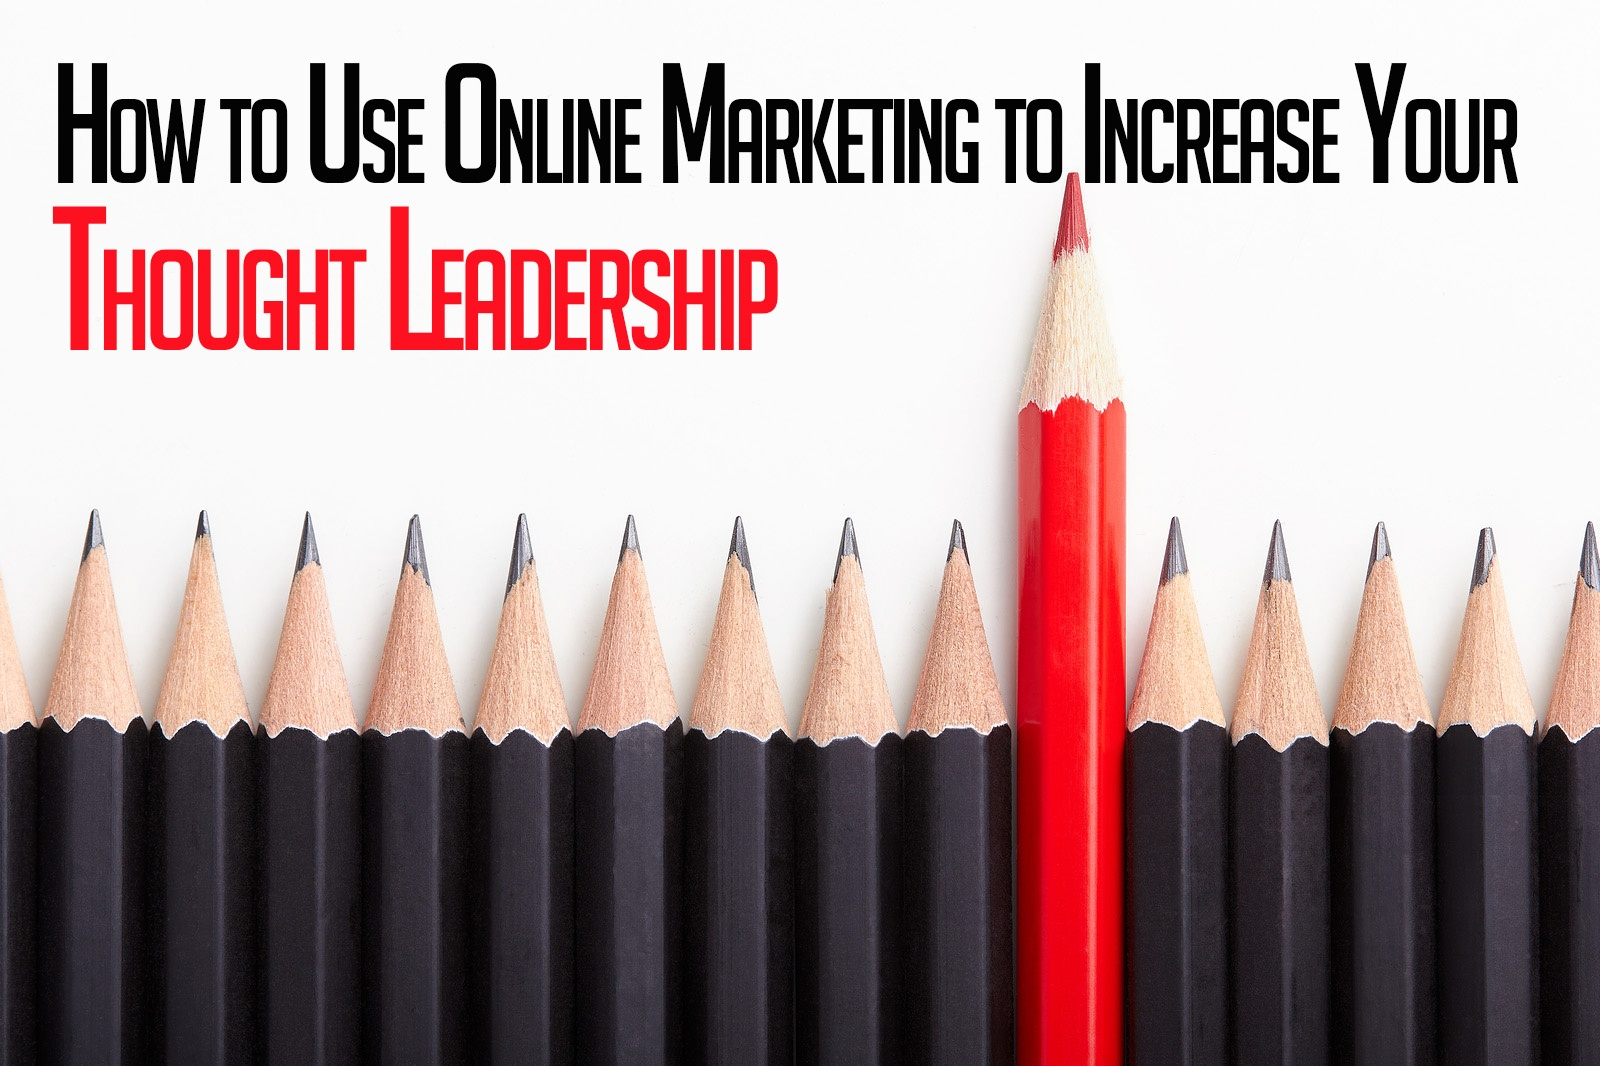 online marketing thought leadership.jpg